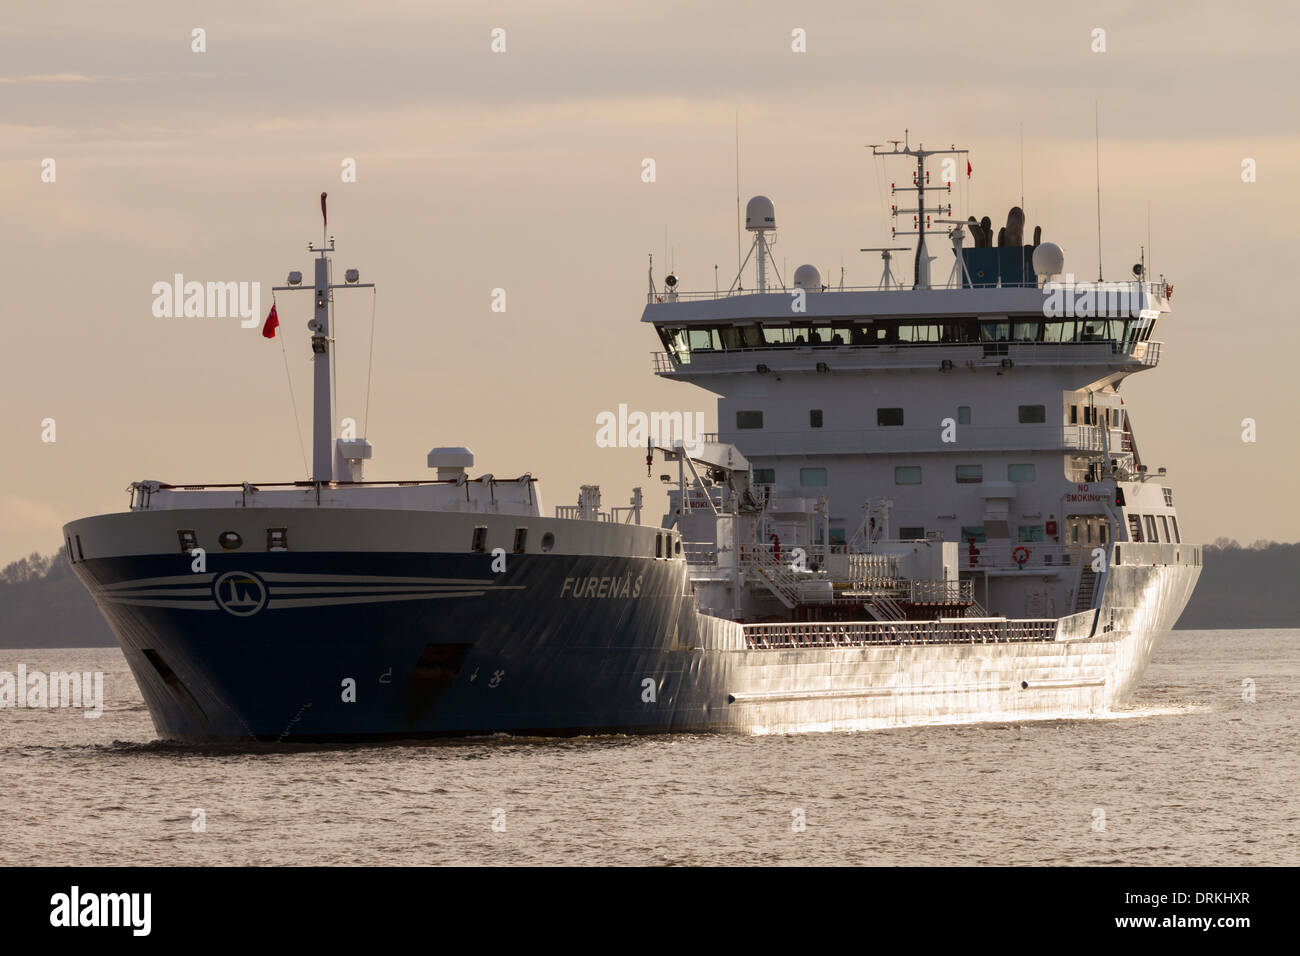 Furenas oil chemical tanker River Mersey, Liverpool, England - Stock Image